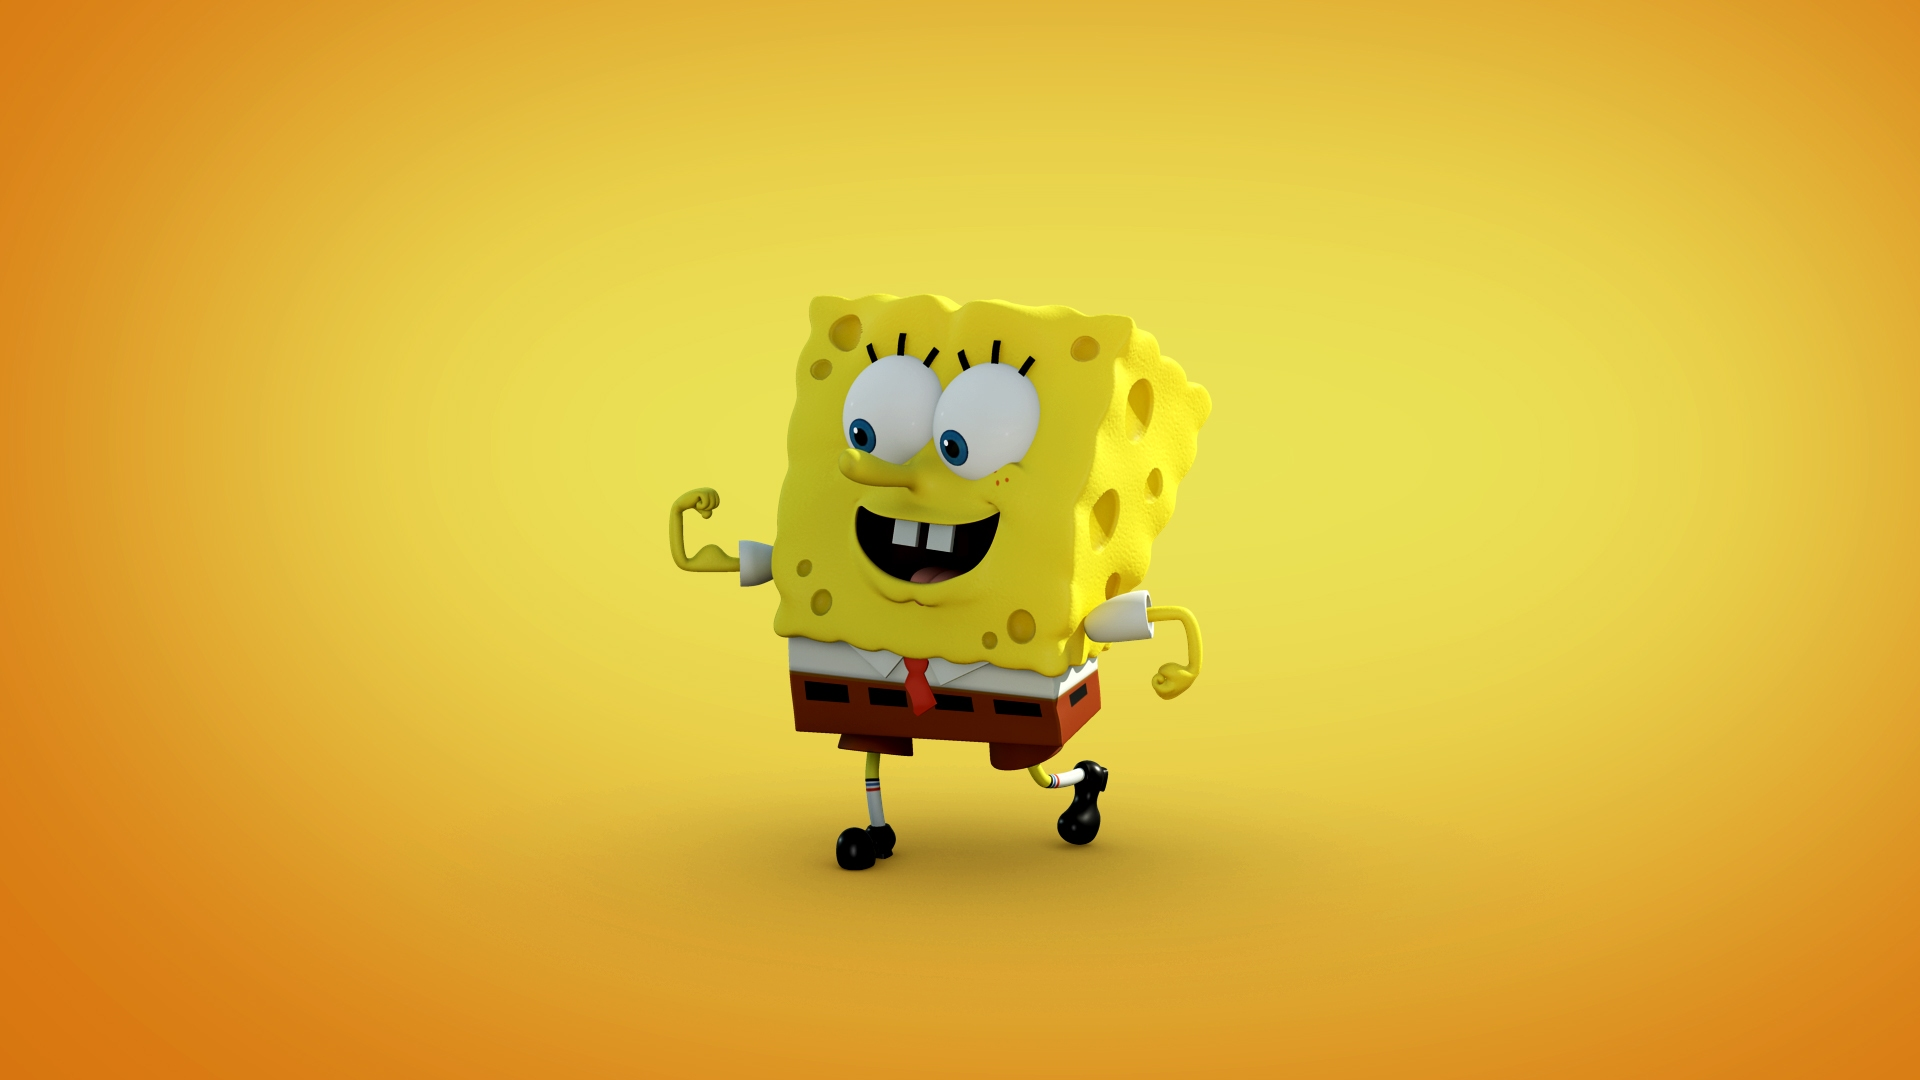 Image Result For Wallpaper Android Spongebob